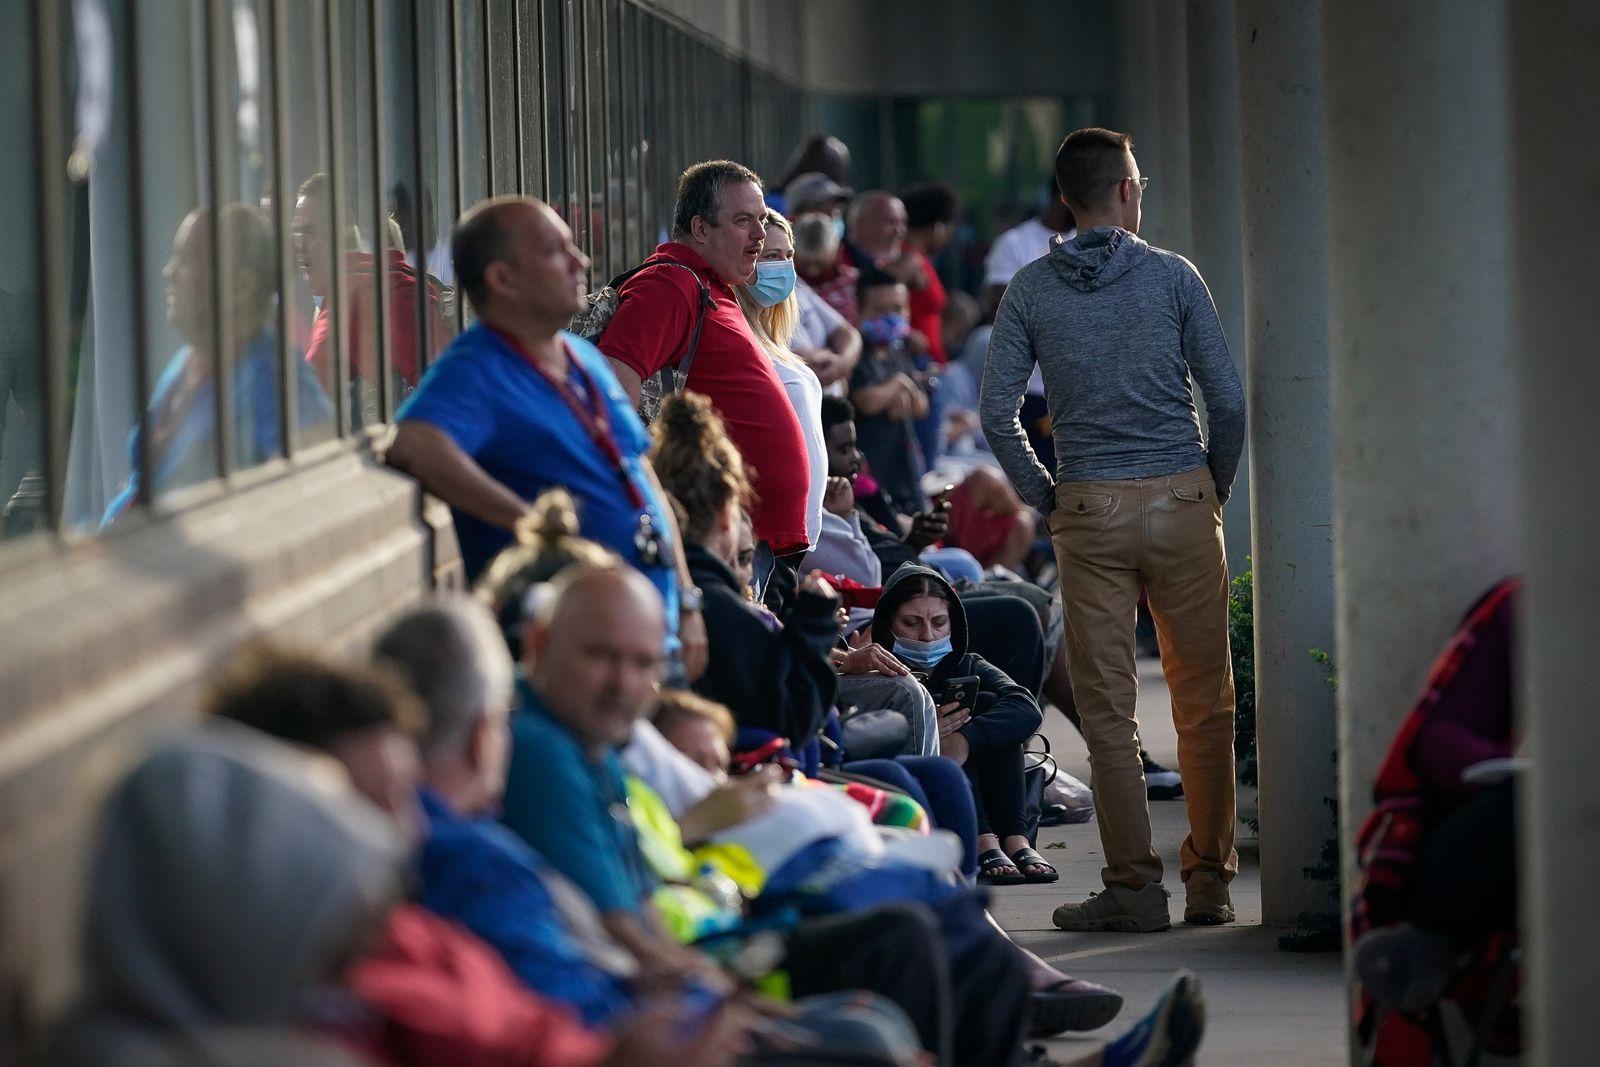 People wait outside Kentucky Career Center in Frankfort